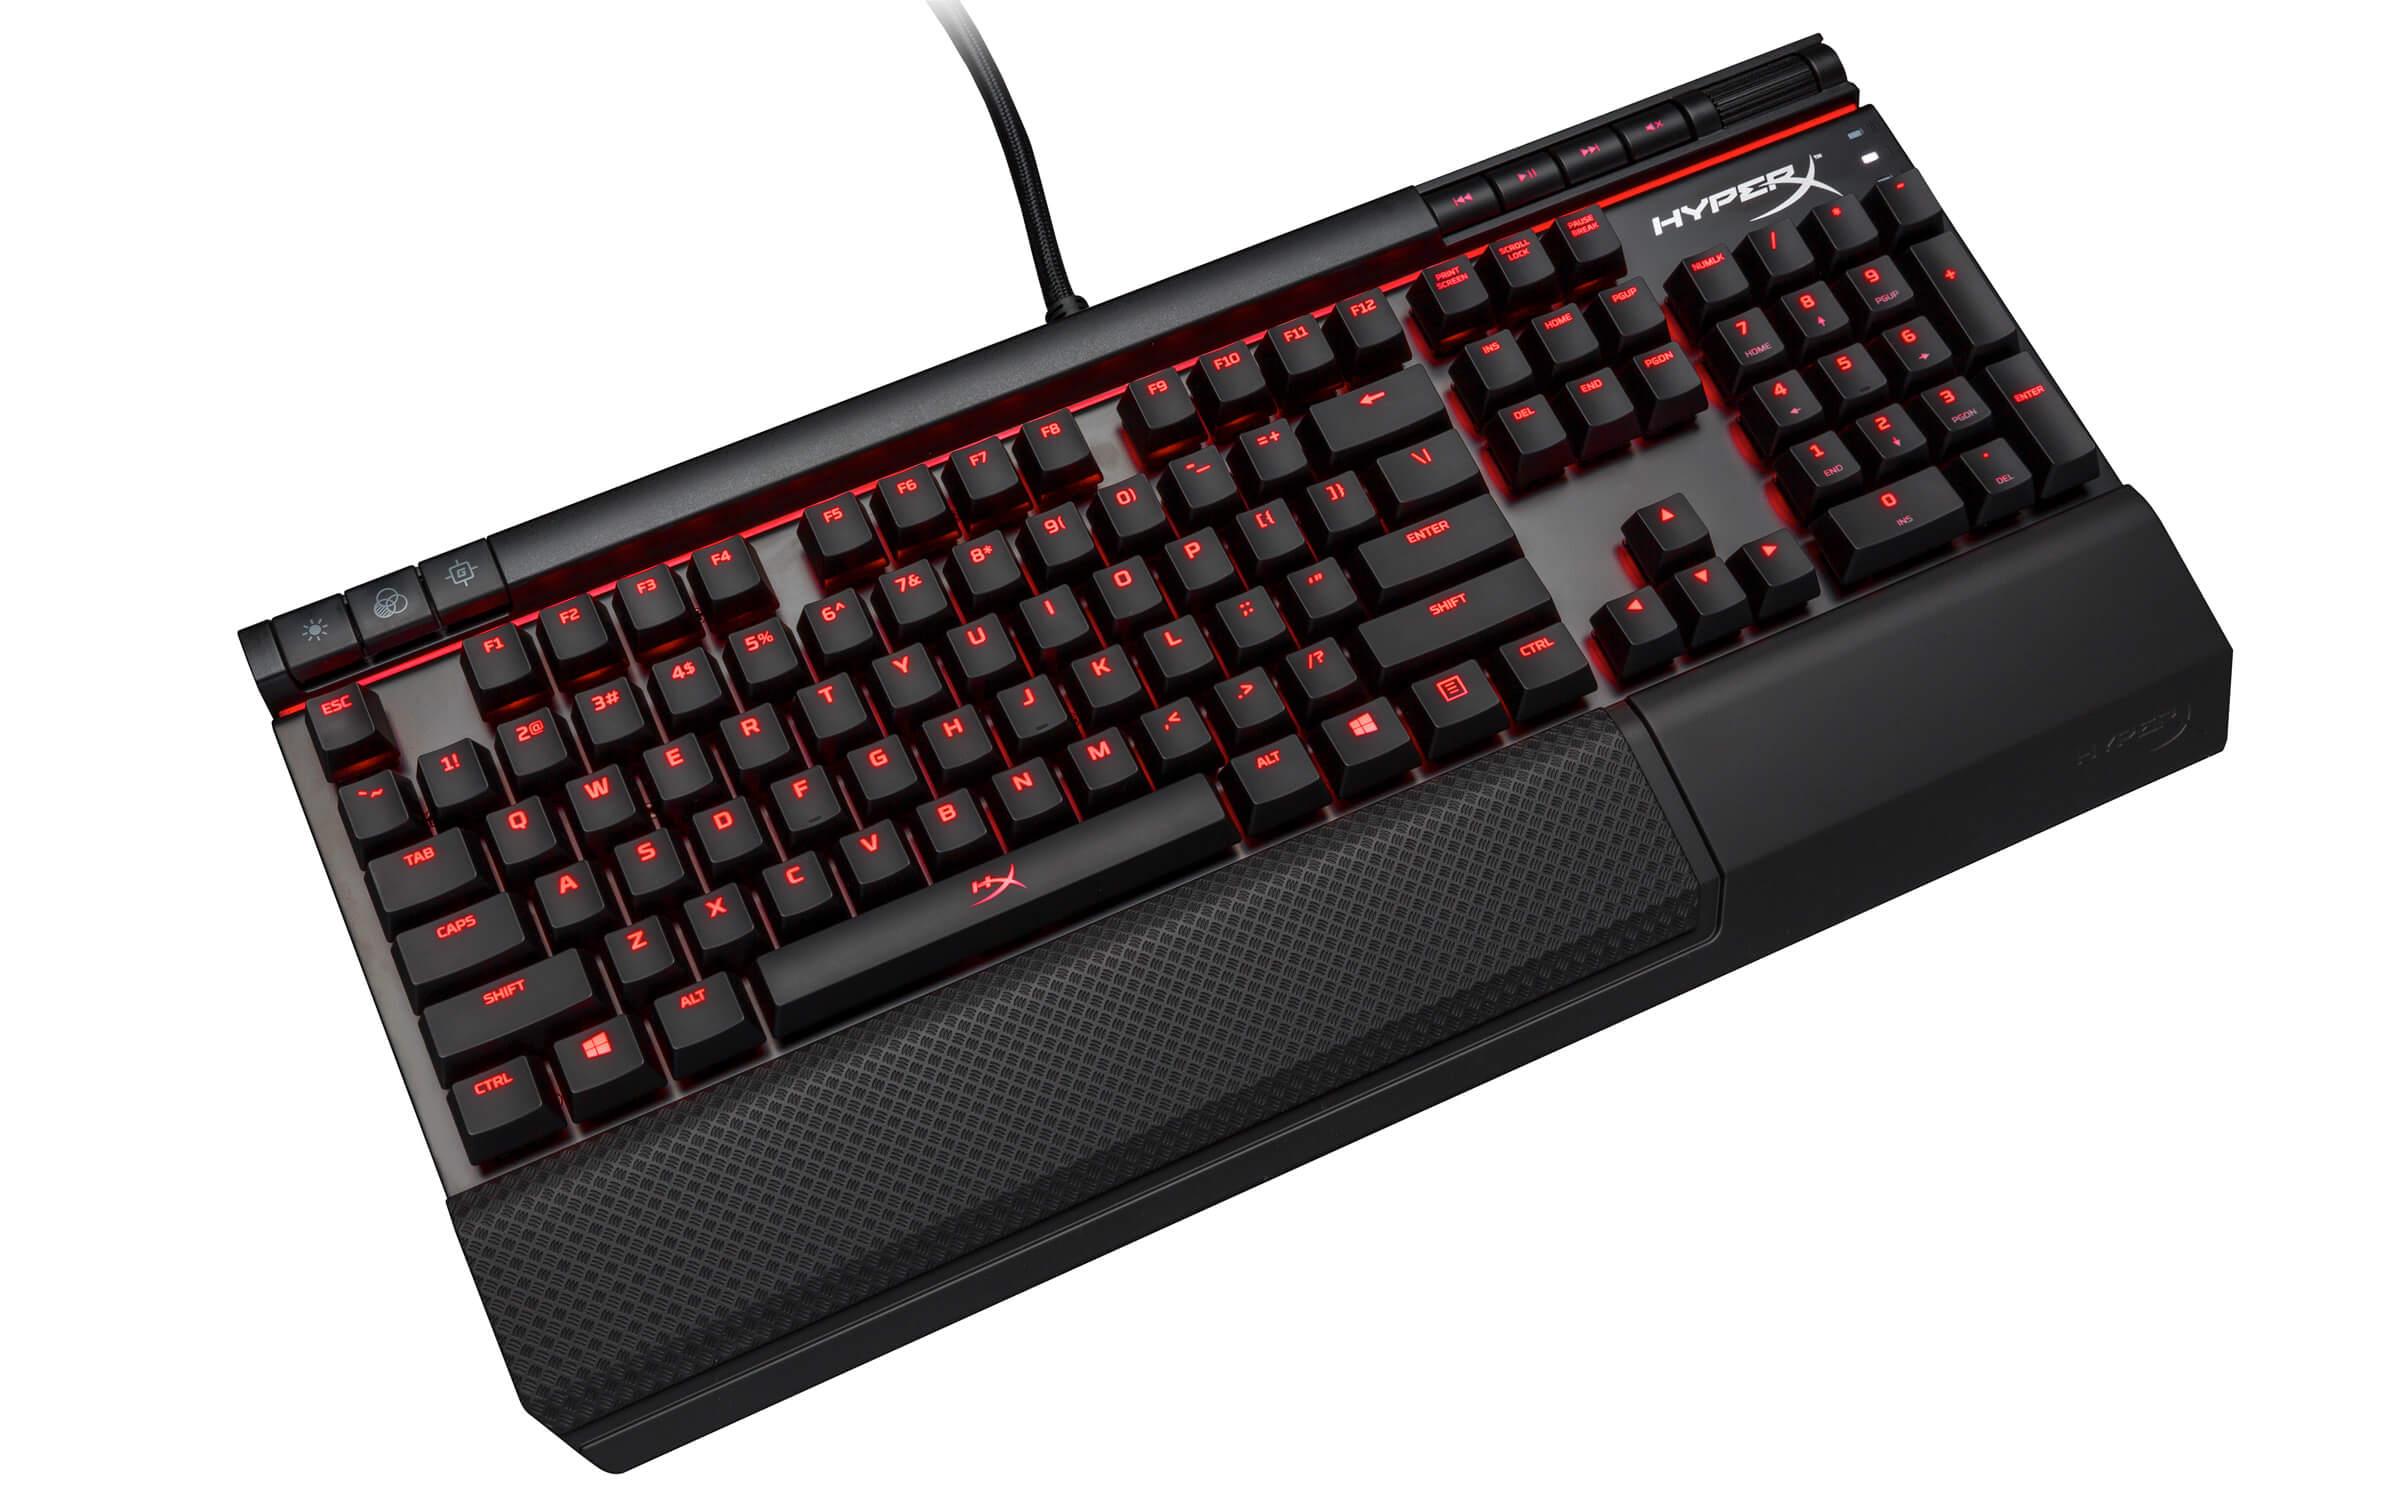 Alloy Elite Mechanical keyboard